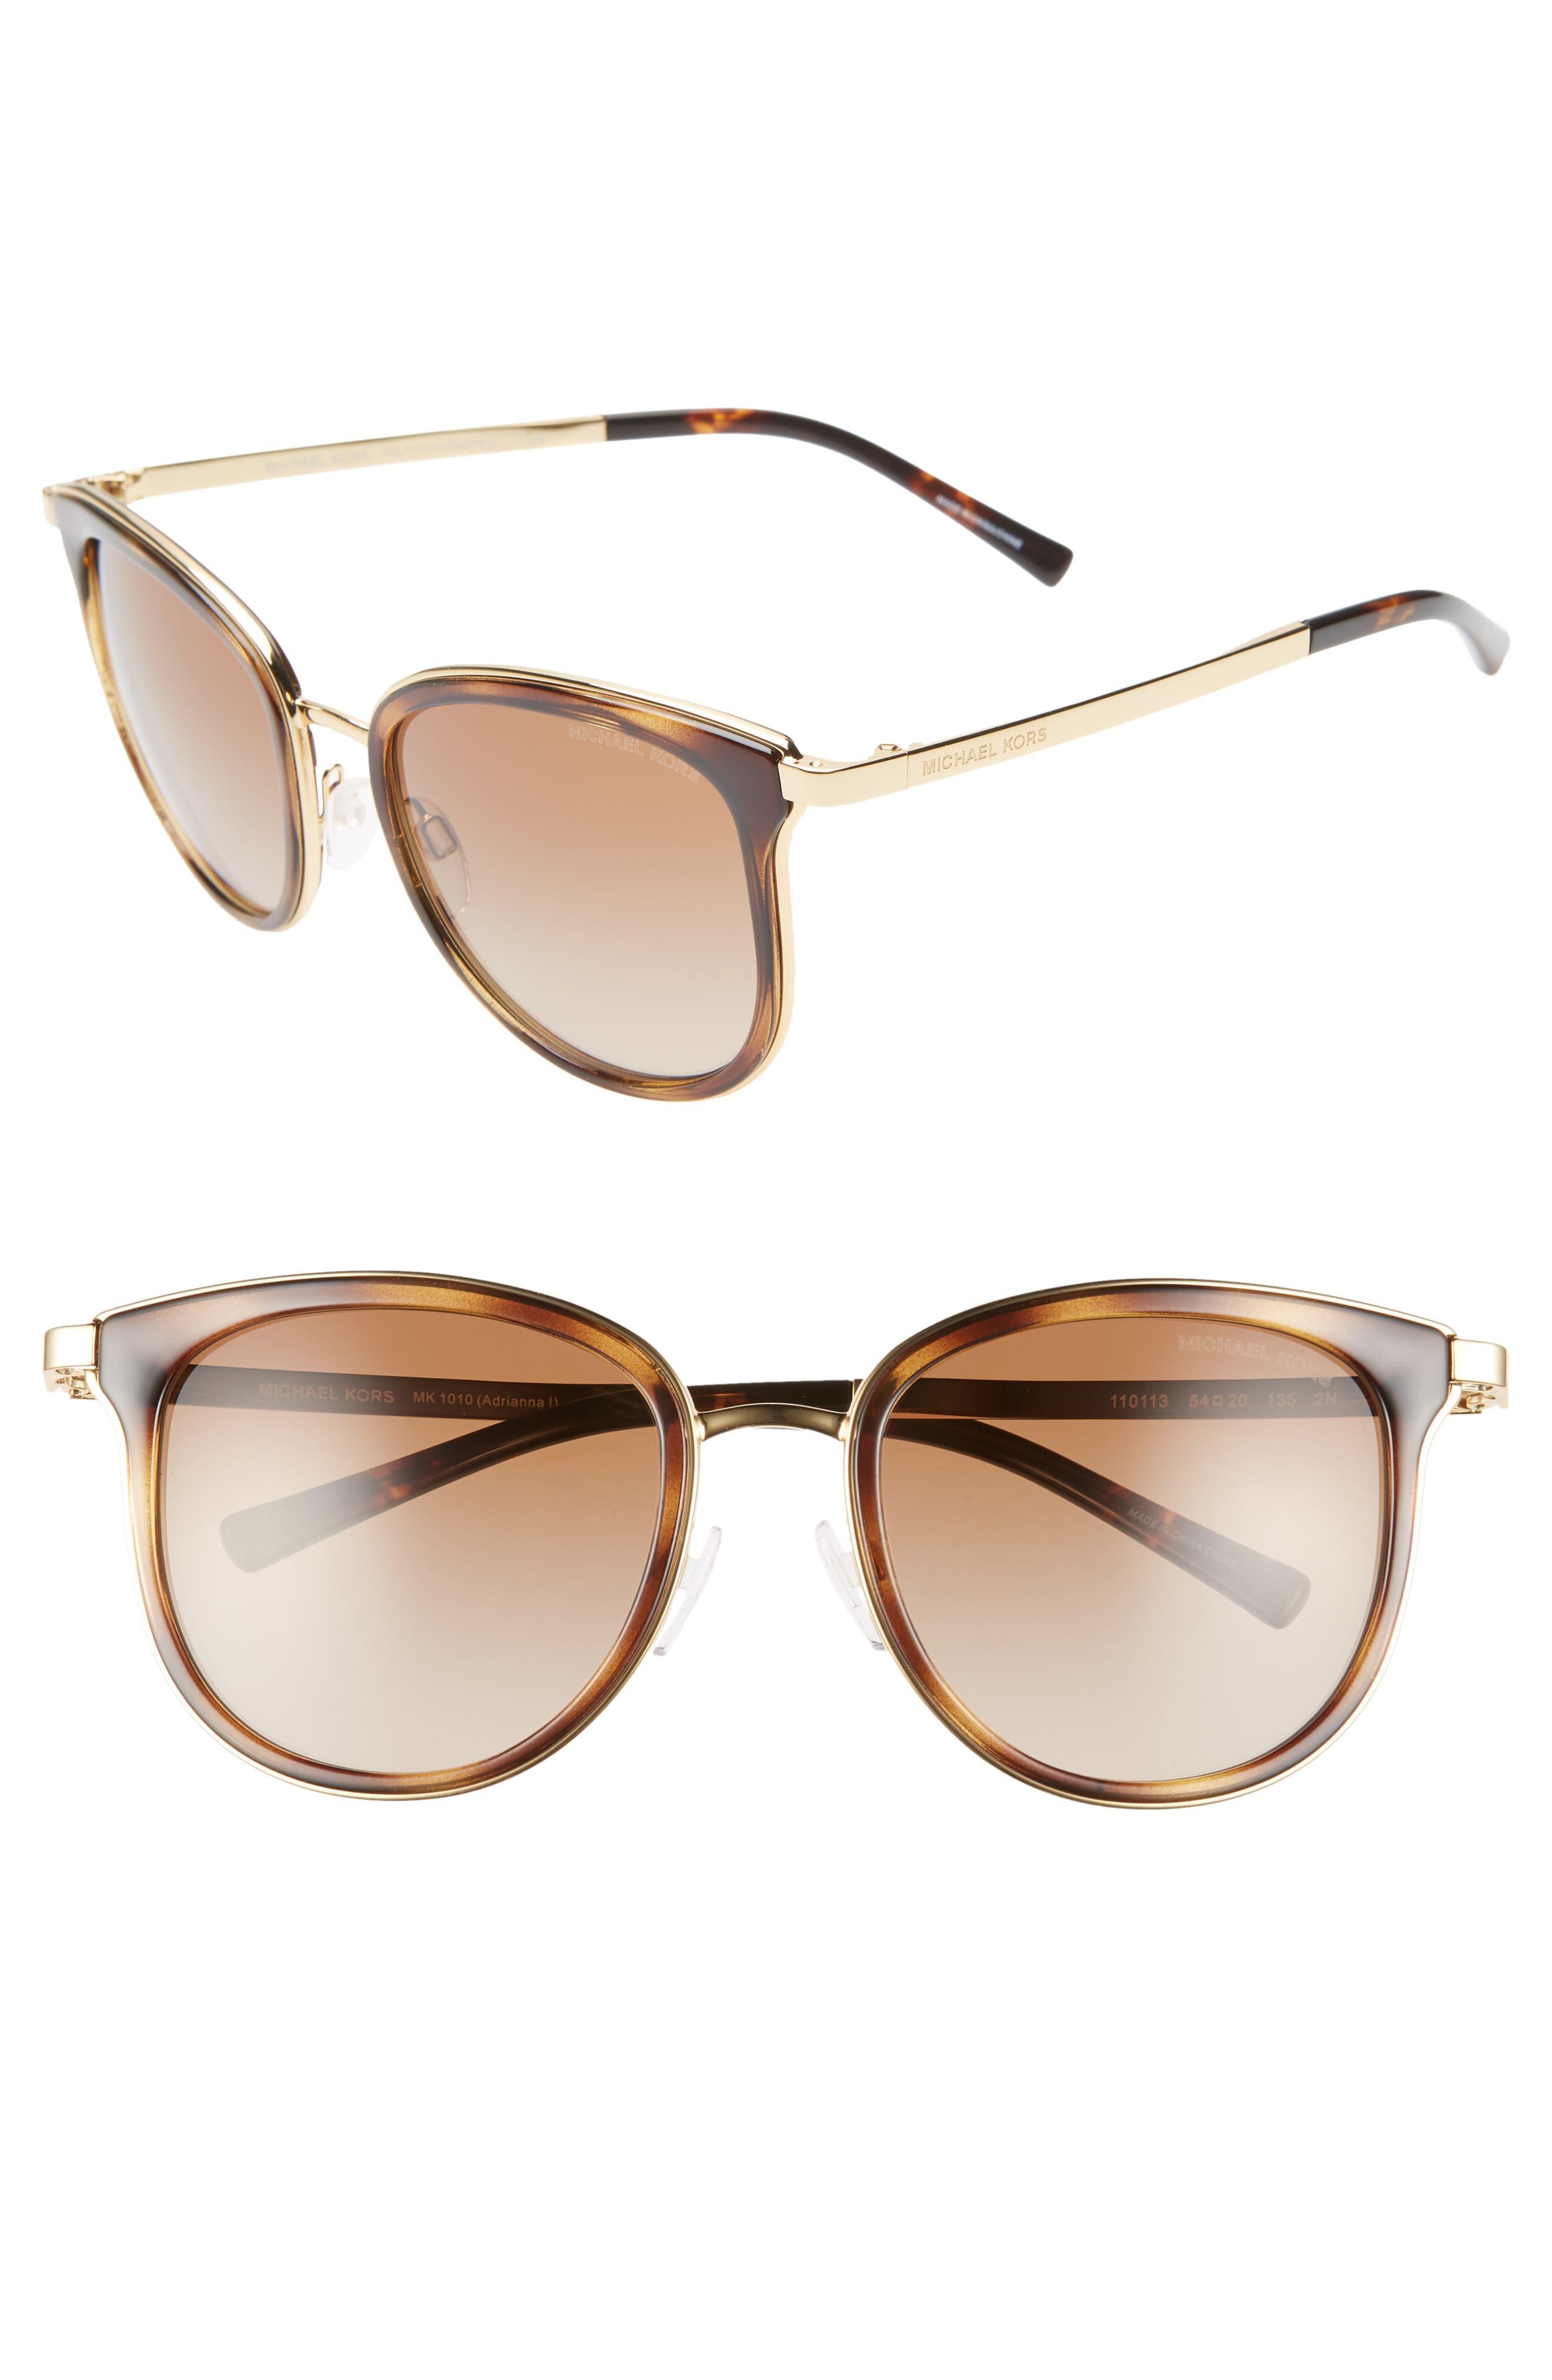 4ed4a8ef45 Michael Kors Sunglasses for Women